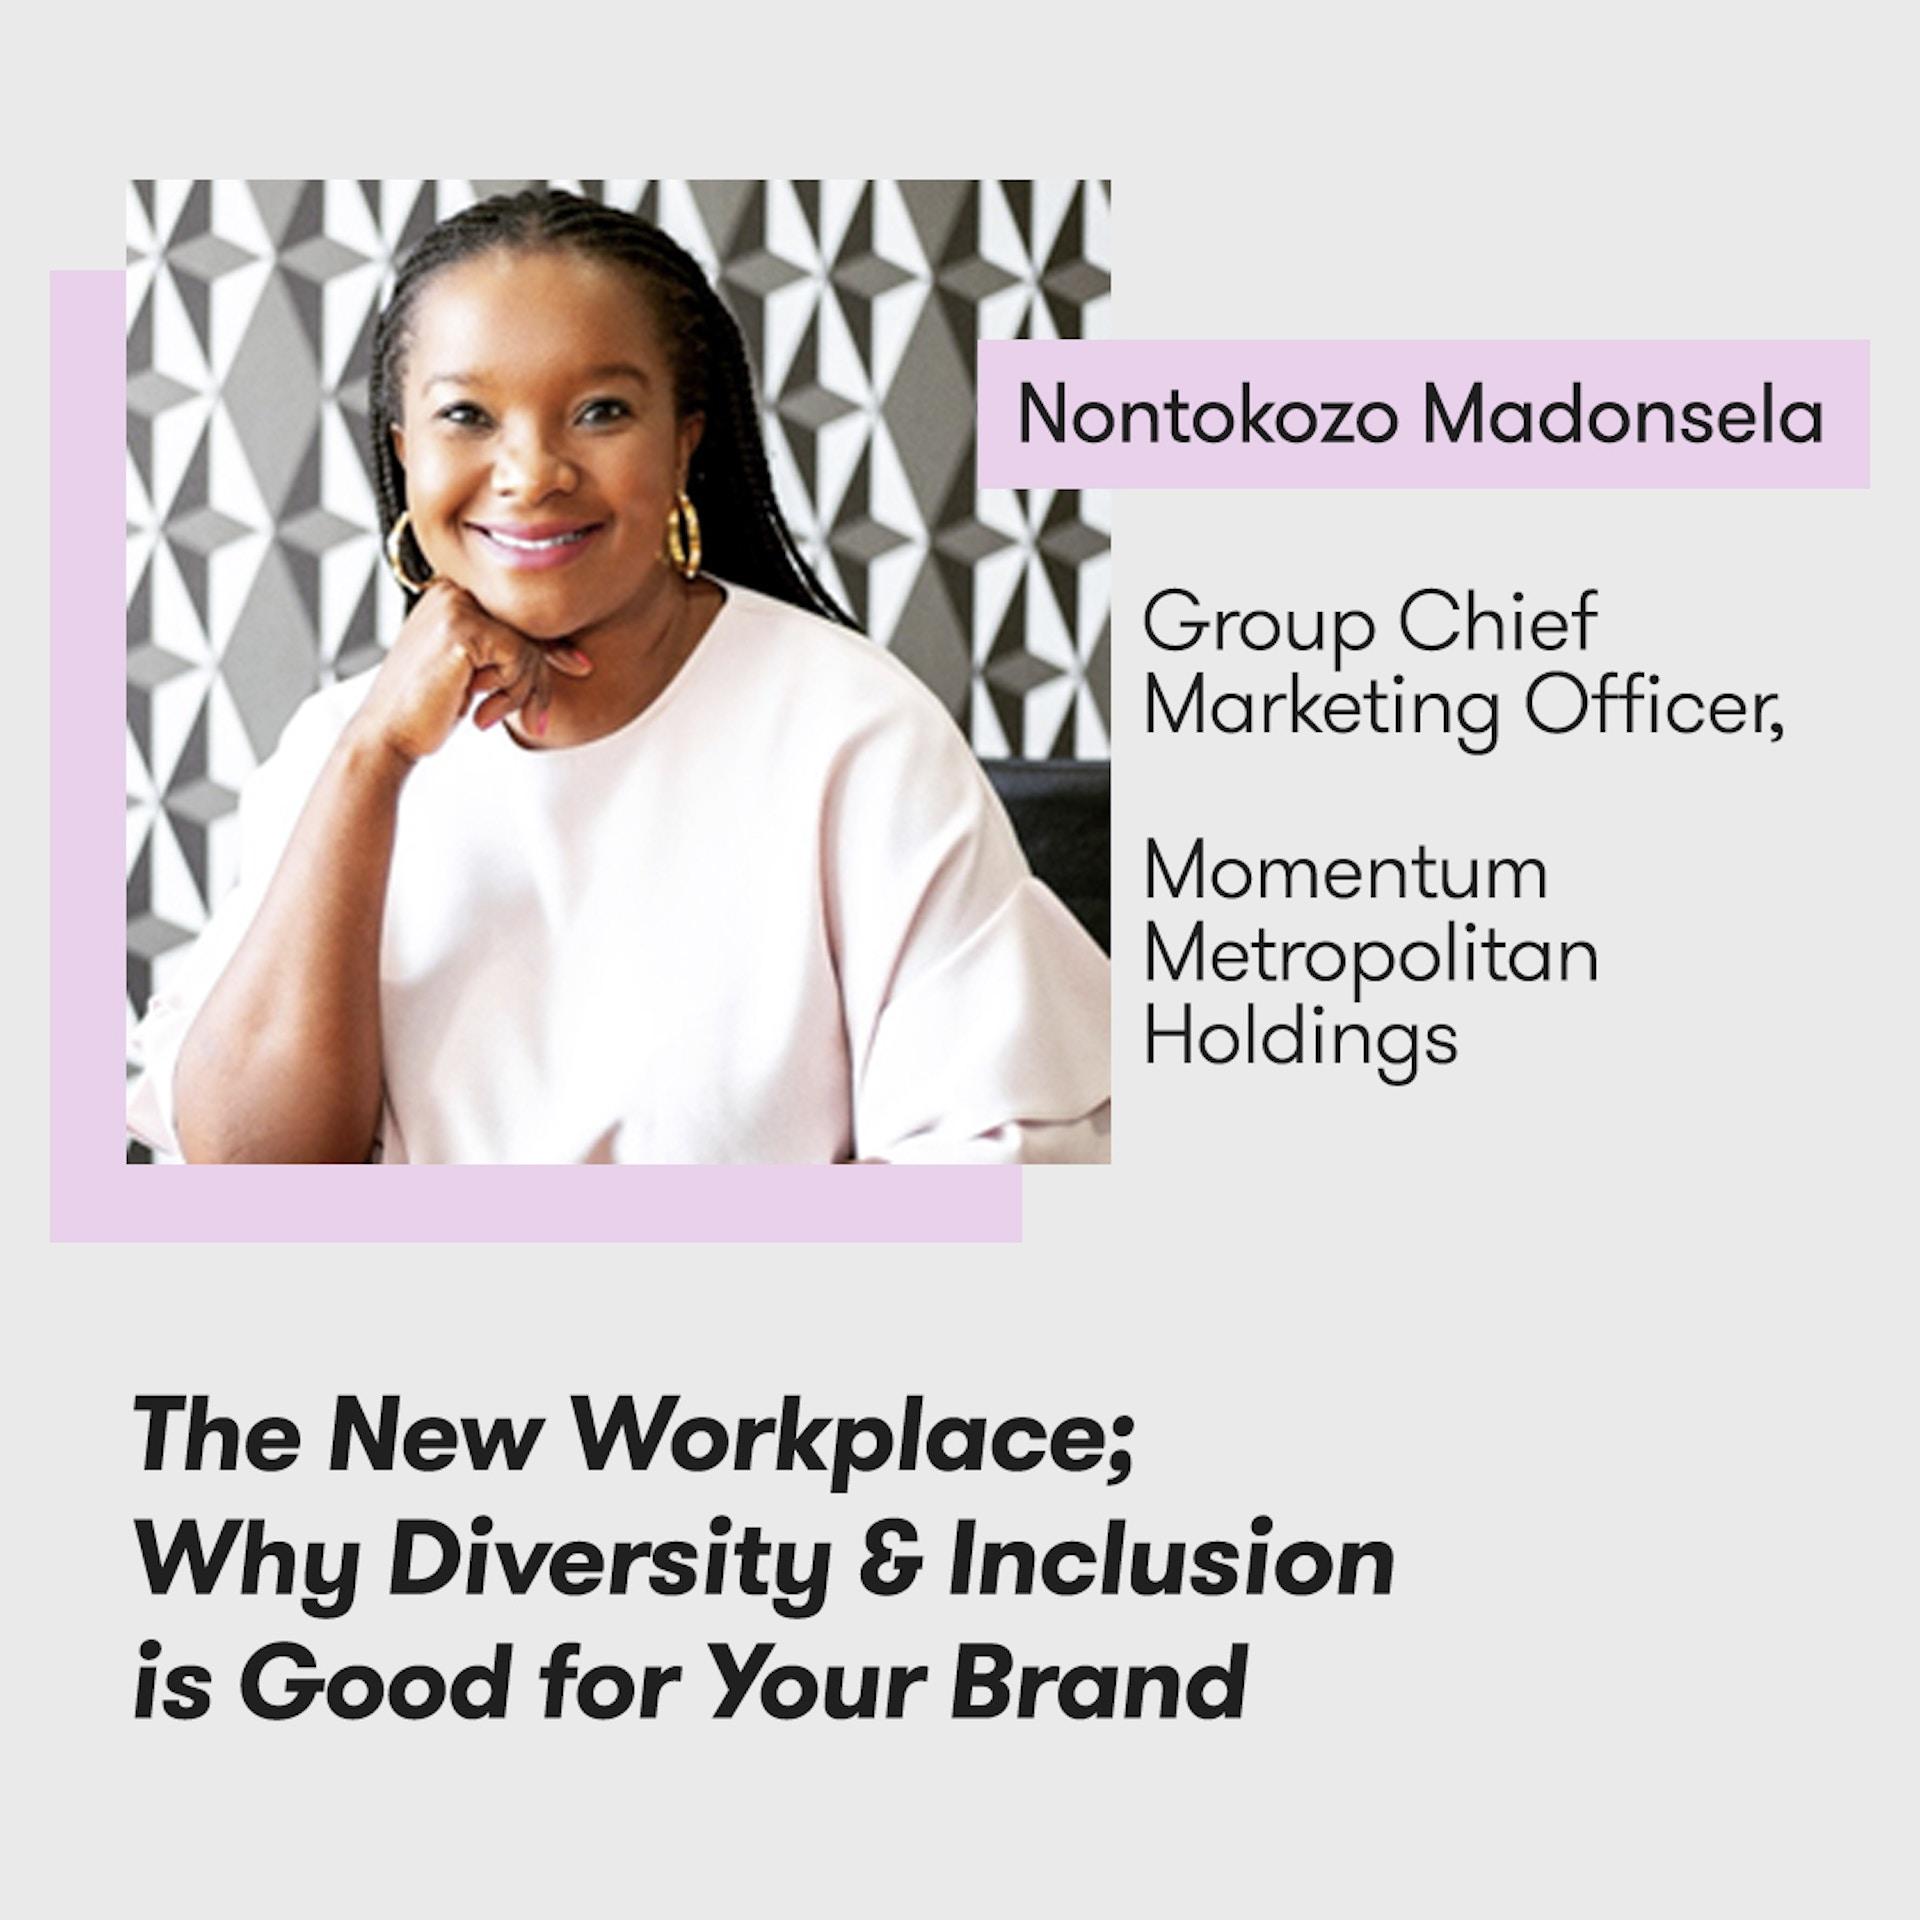 Meltwater Digital Summit - The Future of PR, Marketing and Tech - Nontokozo Madonsela